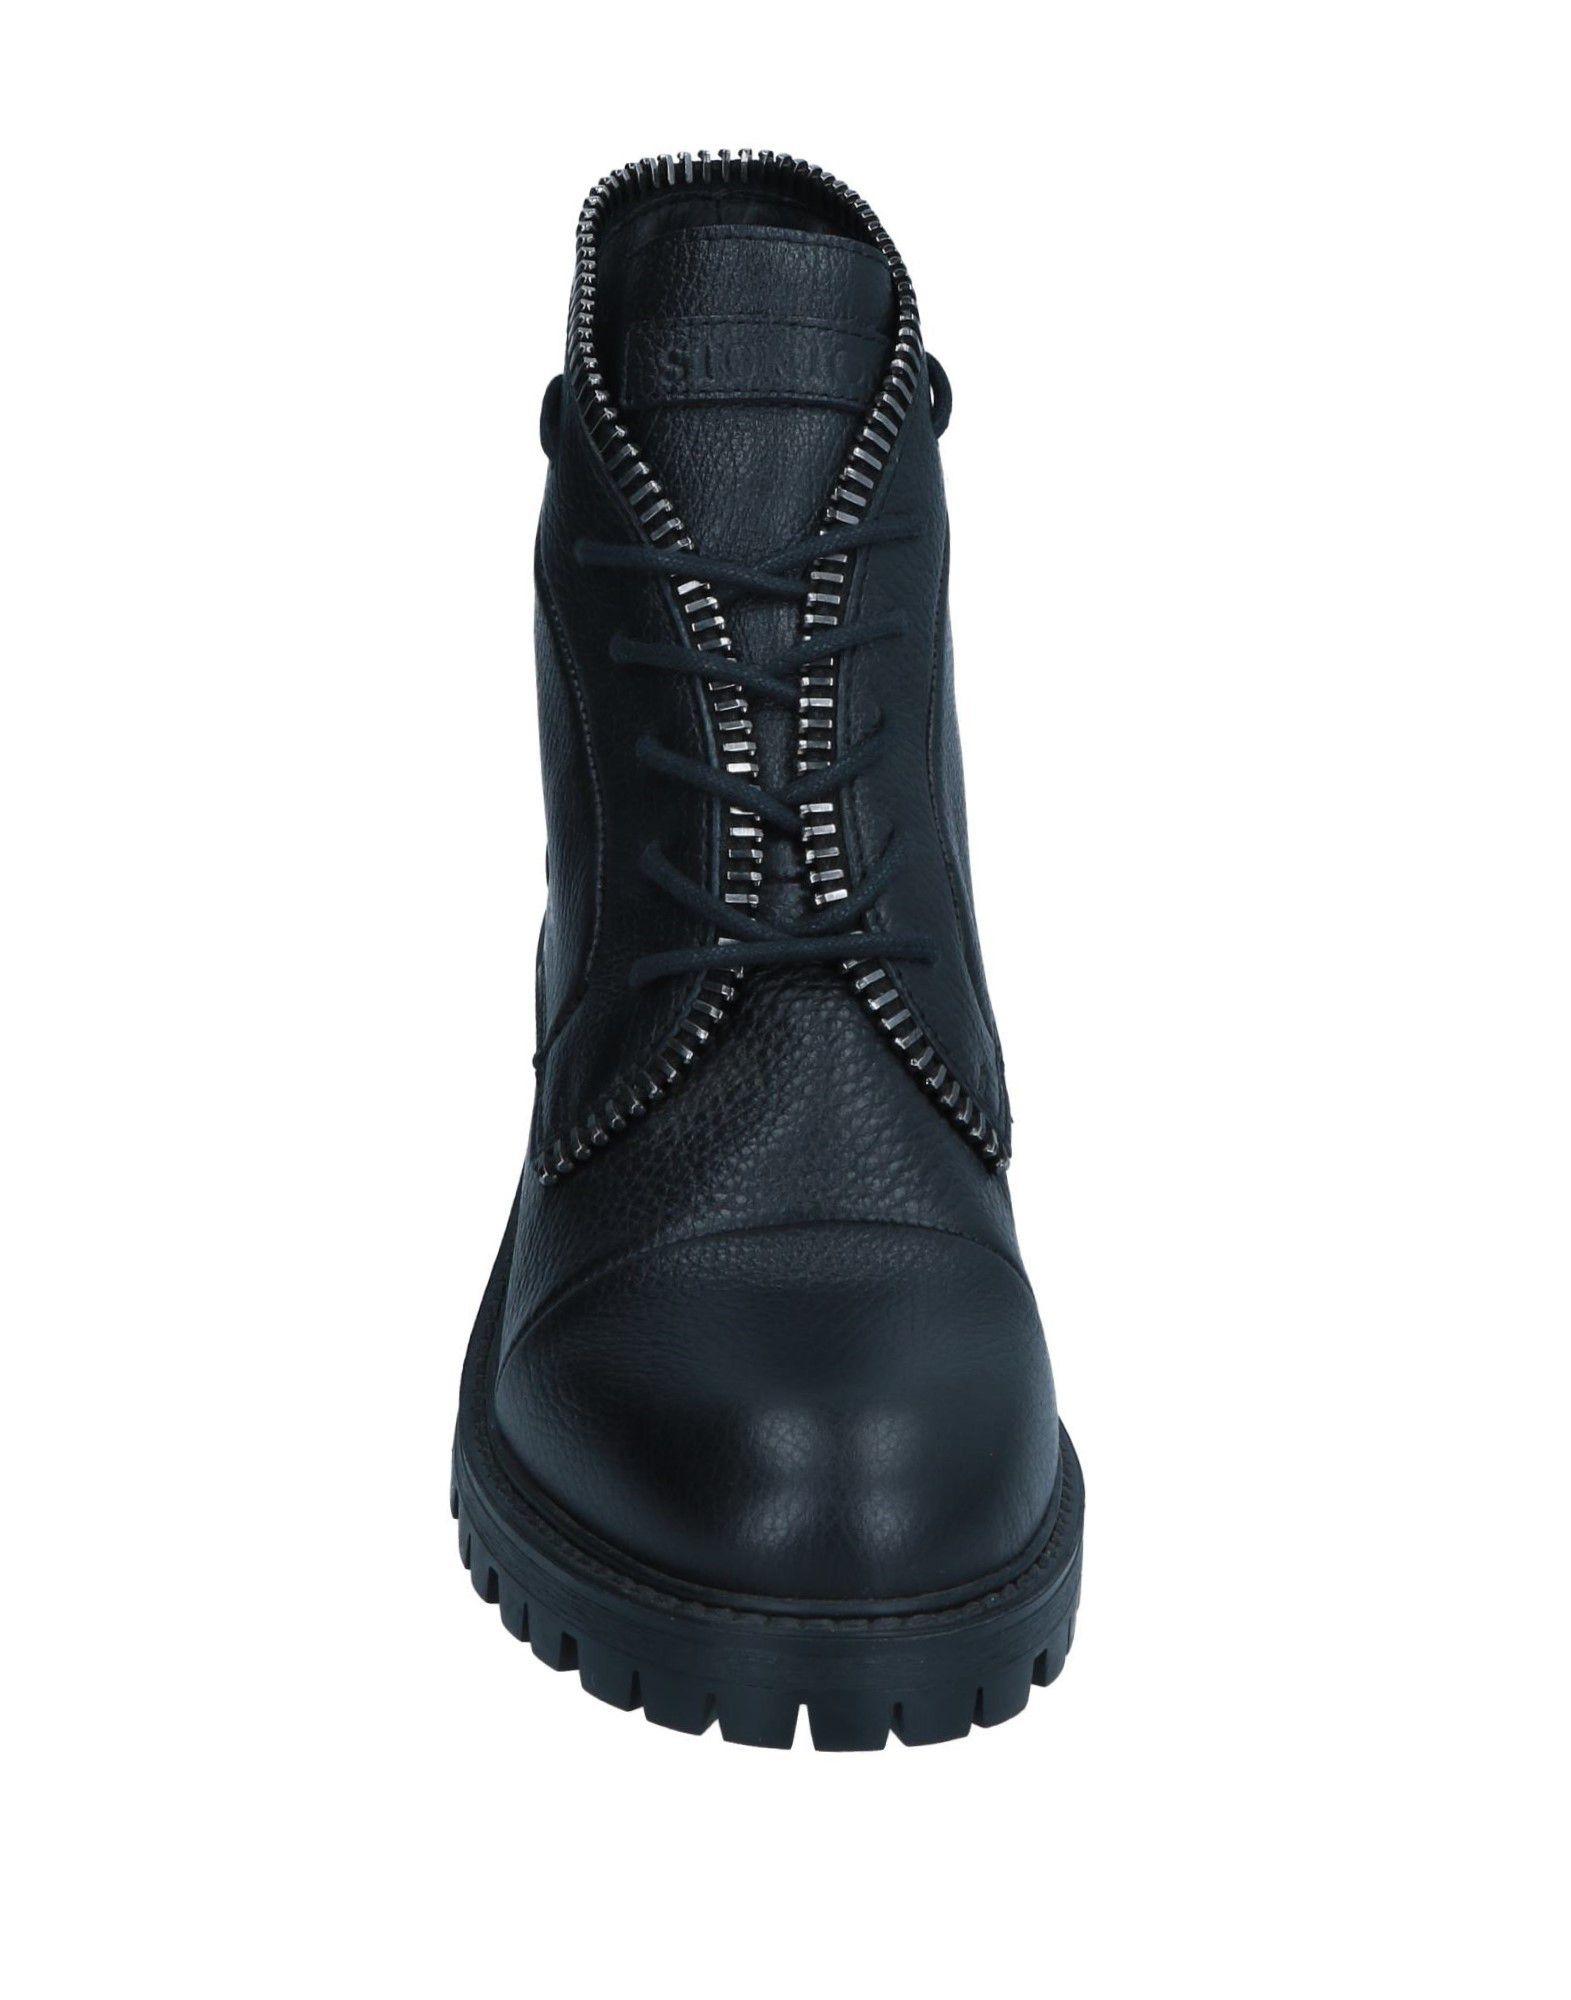 Stilvolle billige Schuhe 11525186GA Stokton Stiefelette Damen  11525186GA Schuhe 8286df